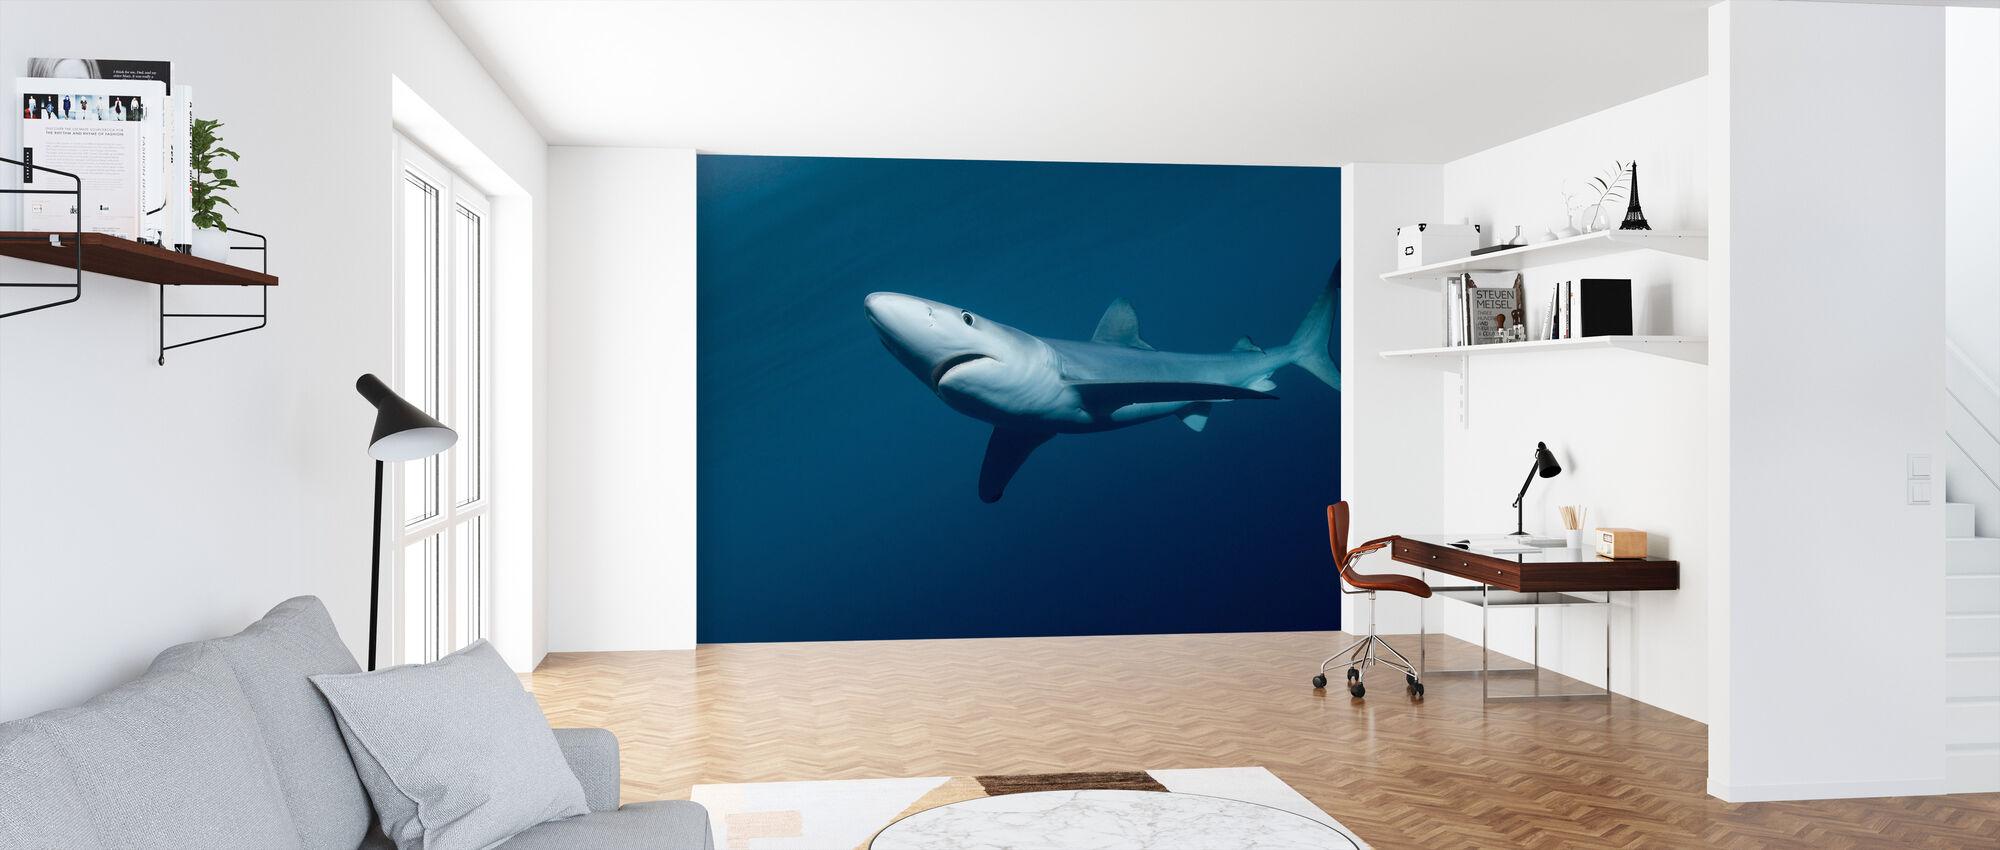 Blue Shark - Wallpaper - Office